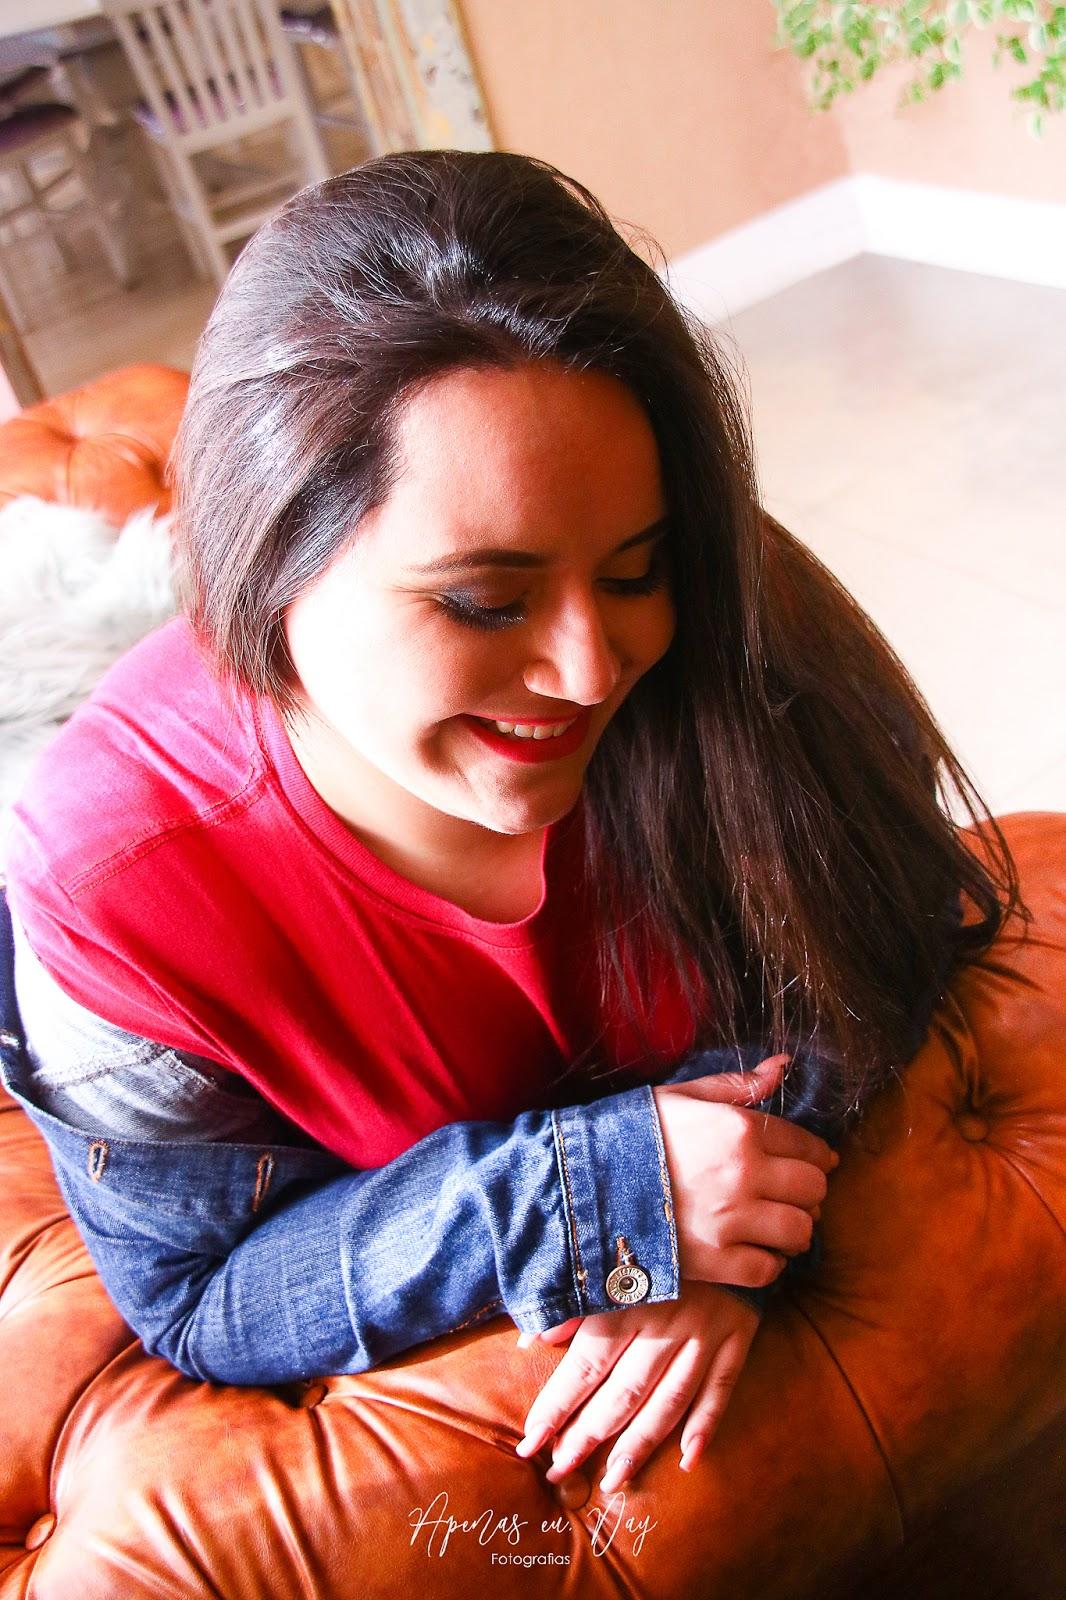 Ensaio feminino de 18 anos realizado na confeitaria mais bonita de Curitiba a Goodies Bakery. Veja agora!